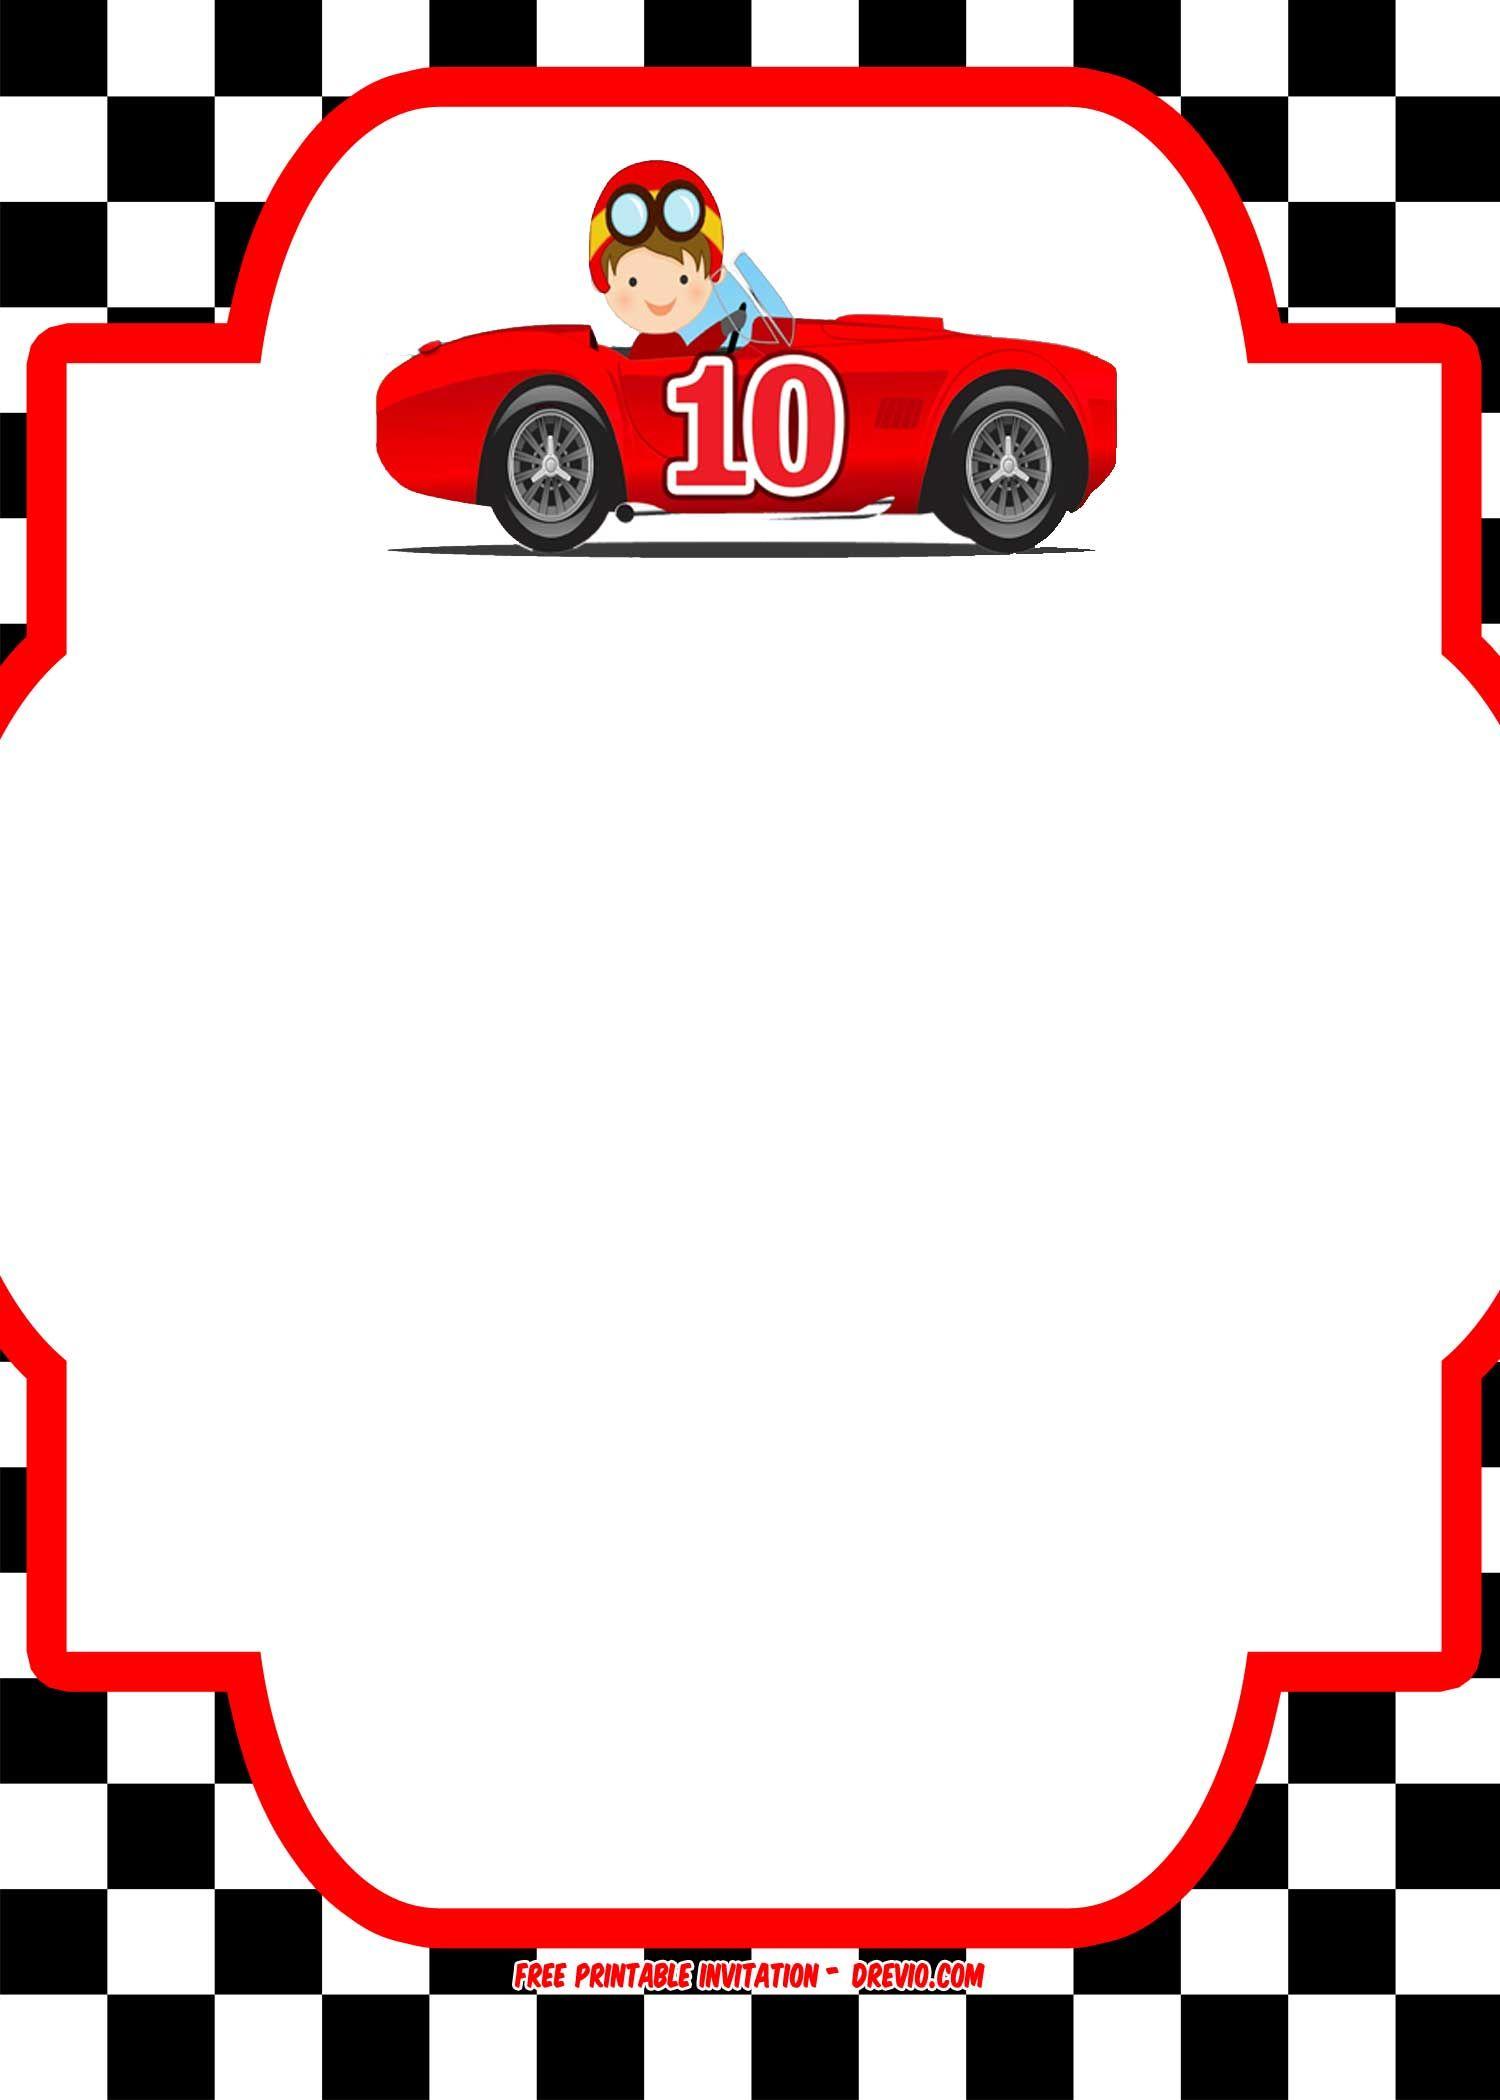 Race Car Invitations Printable Free Xc43